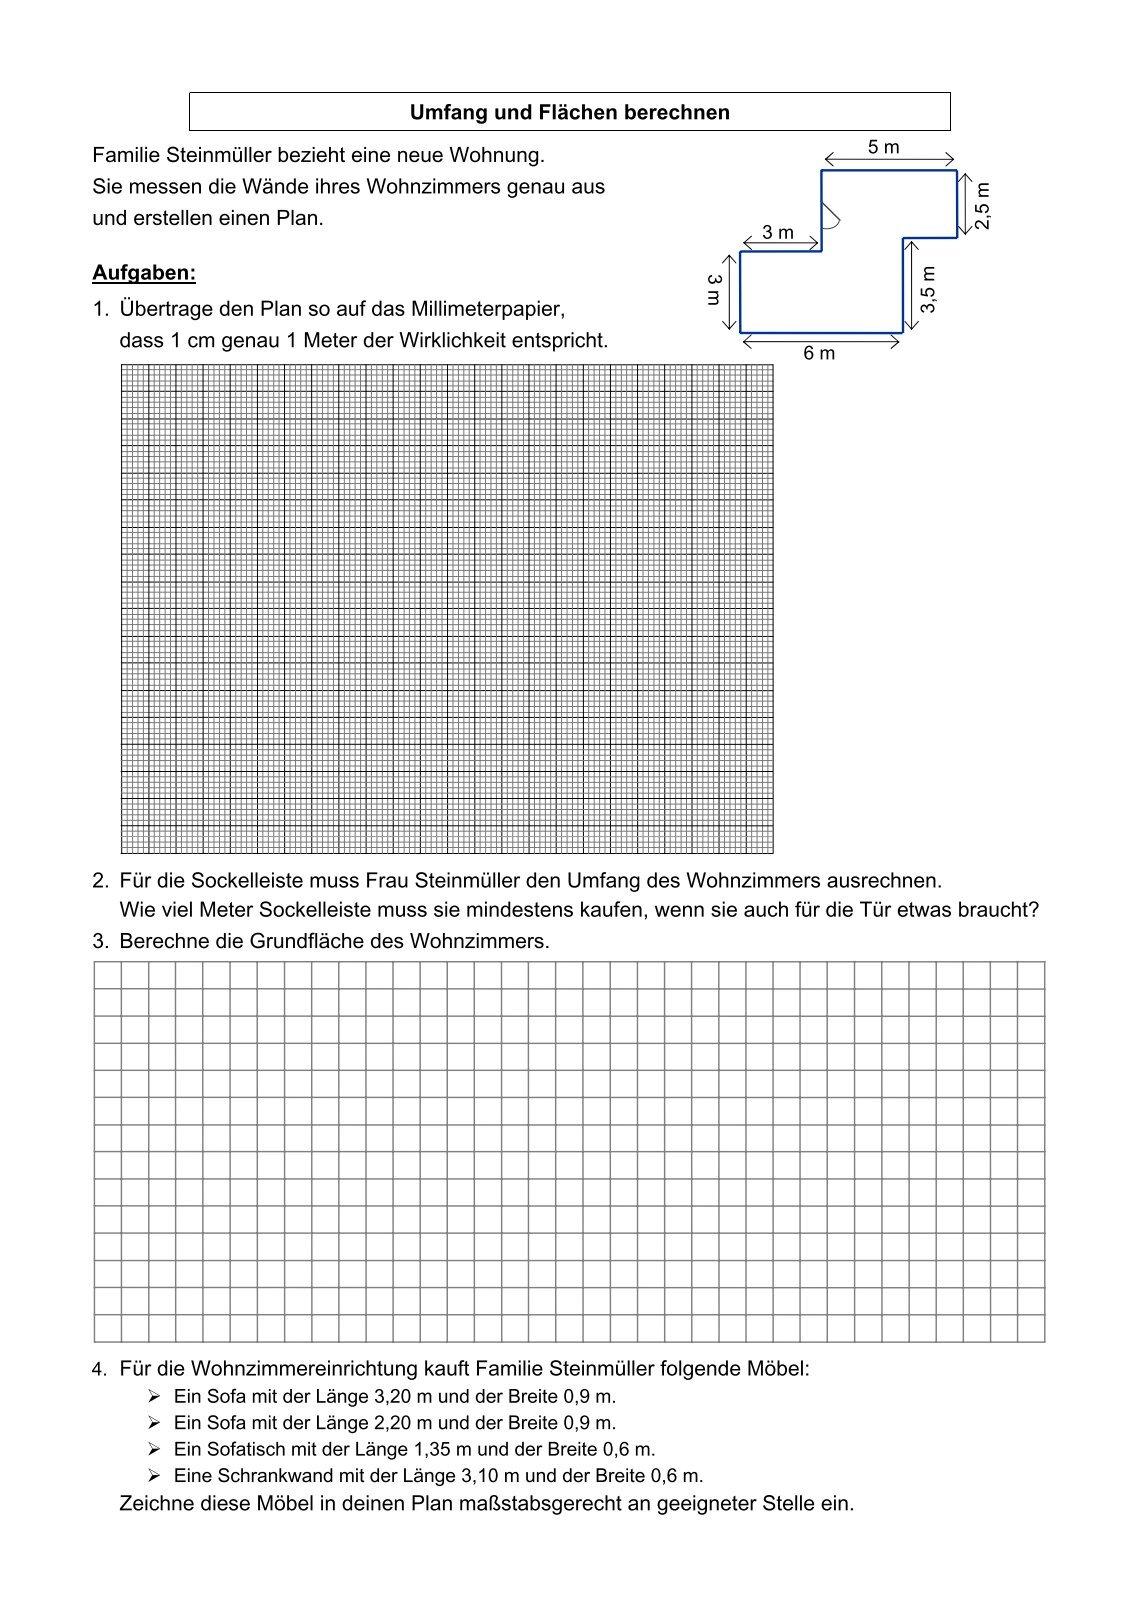 Nett Algebra 2 Arbeitsblatt Mit Antworten Fotos - Arbeitsblatt ...